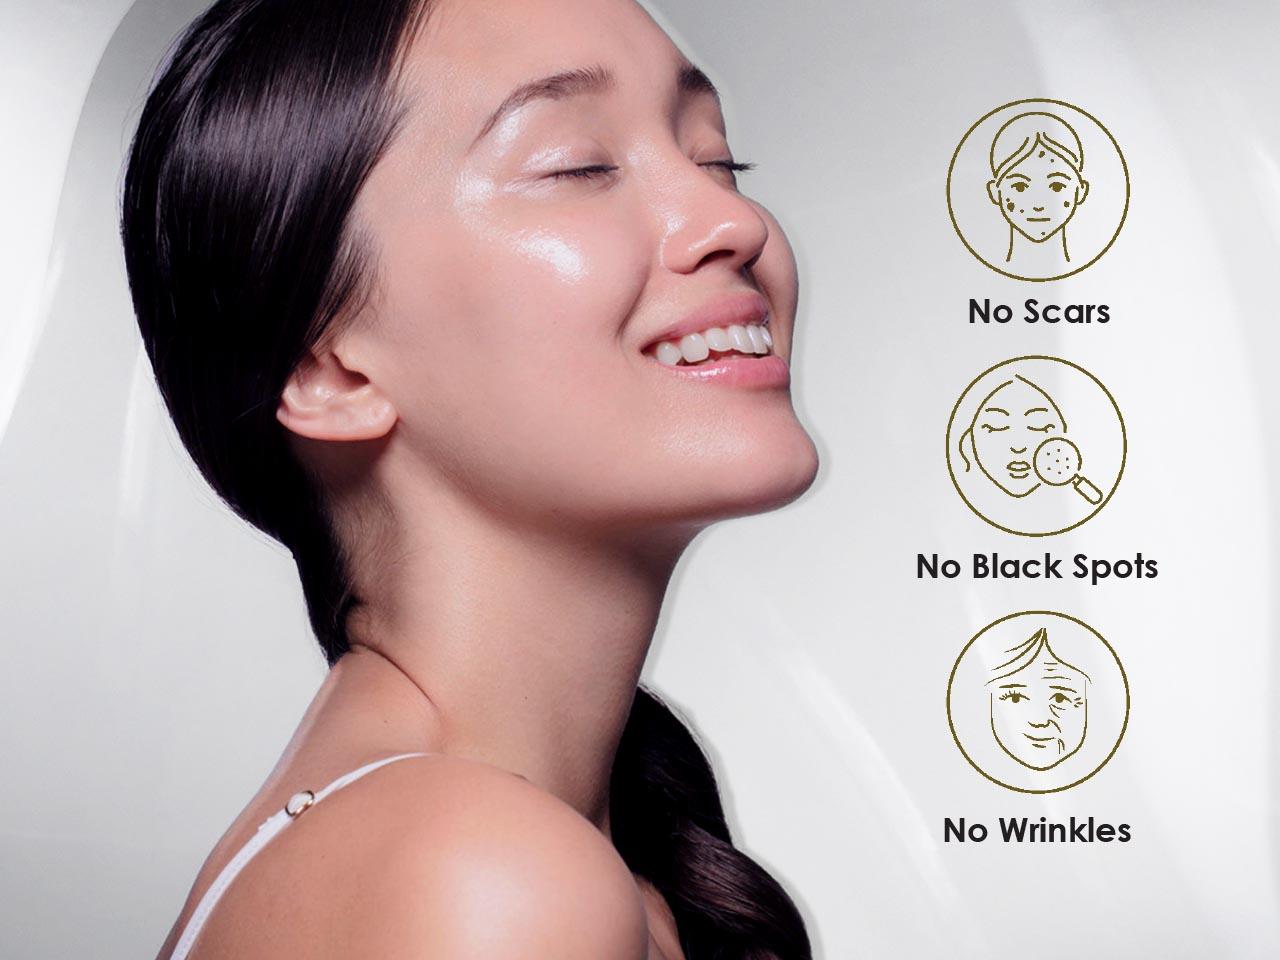 Porcelain Skin Promo